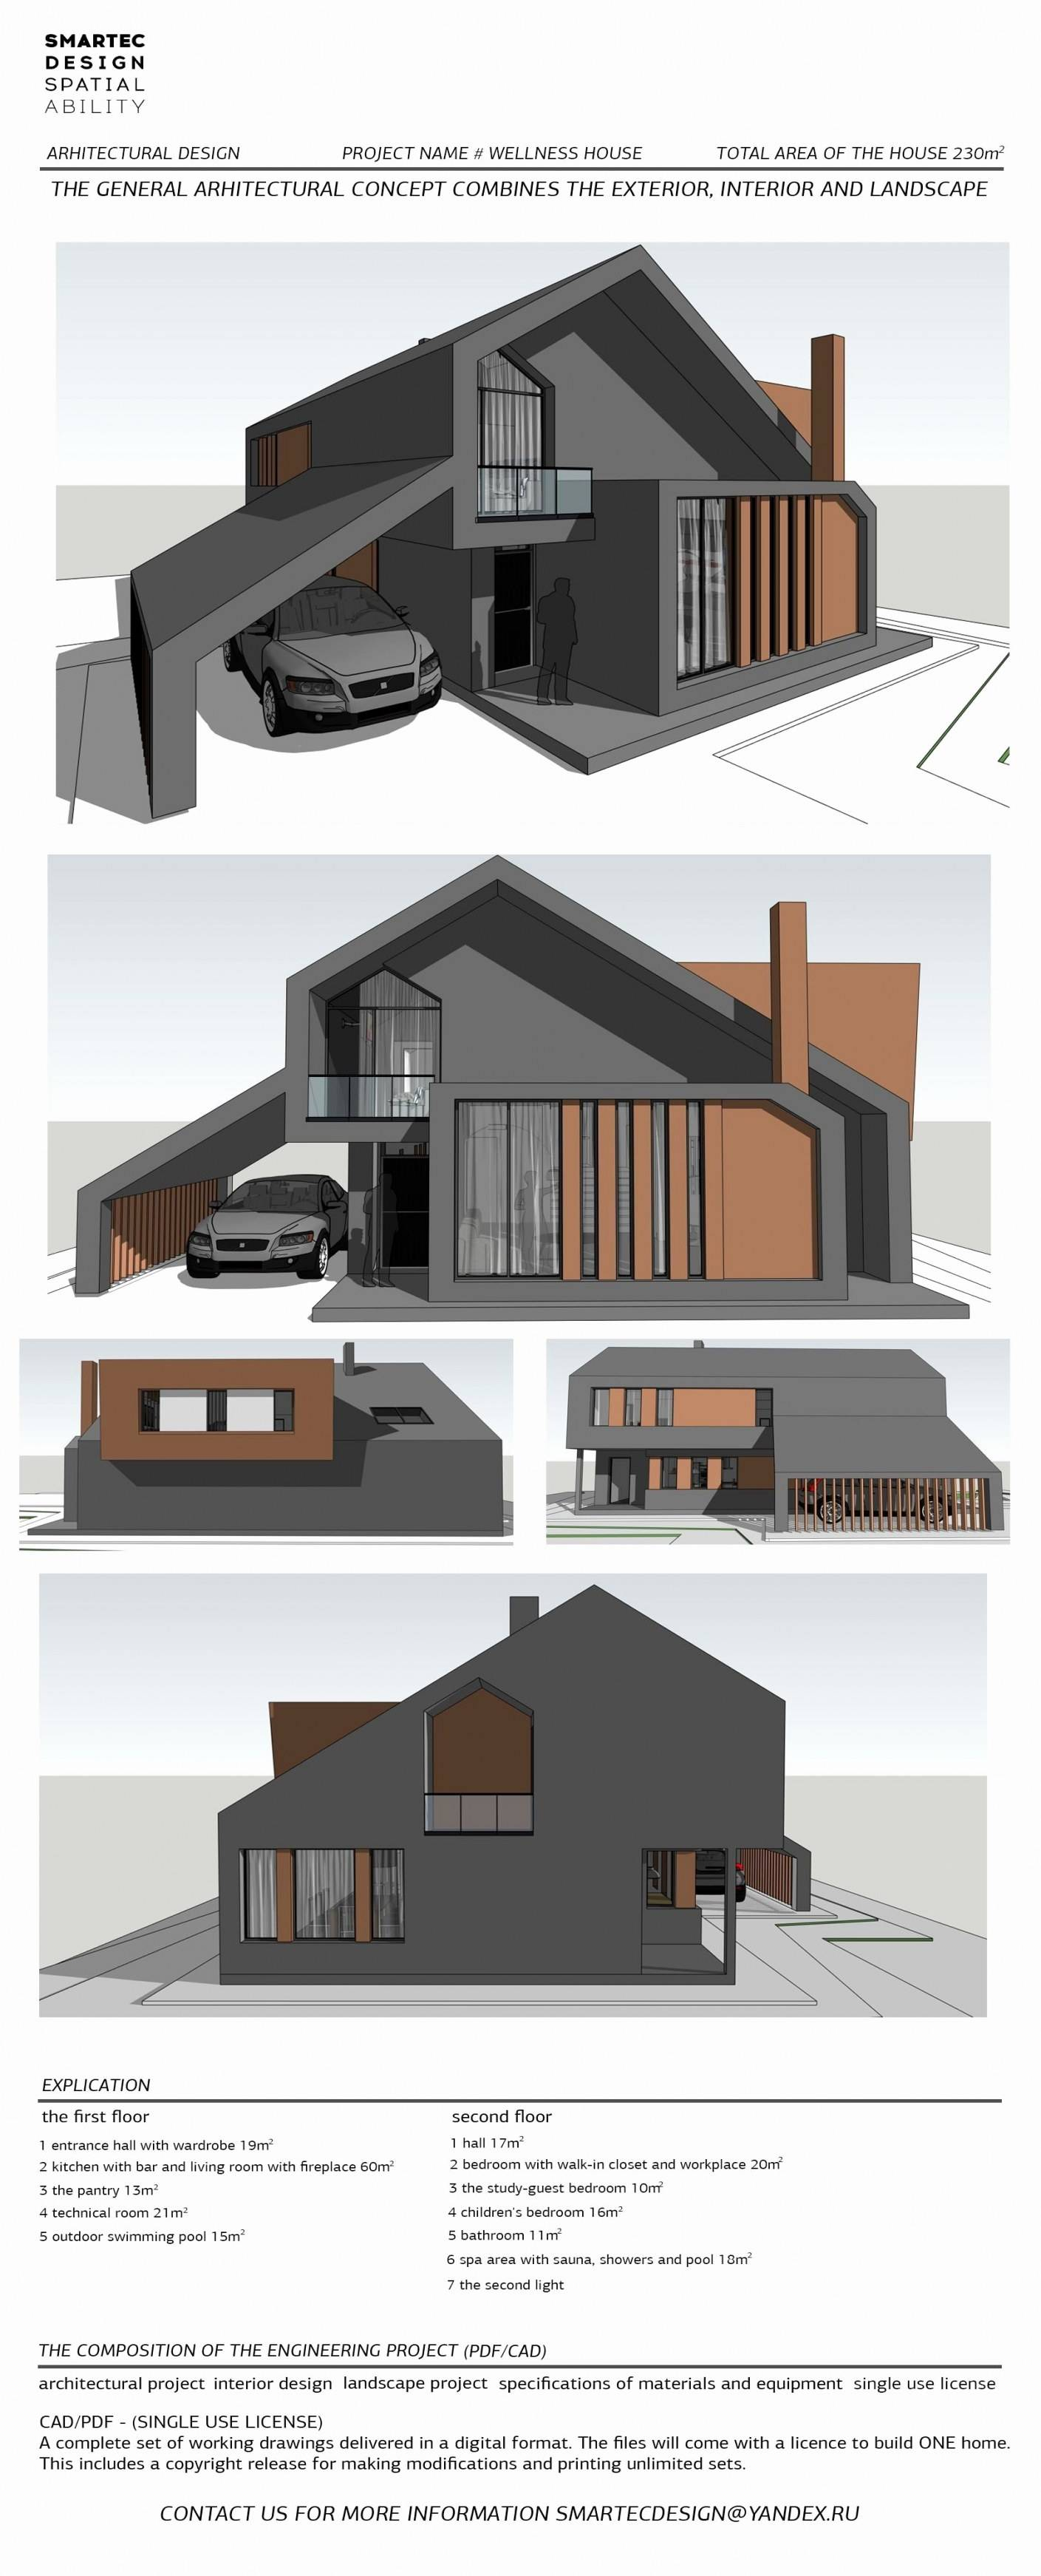 roof garden design inspirational home roof design 59 inspirational simple beautiful house of roof garden design